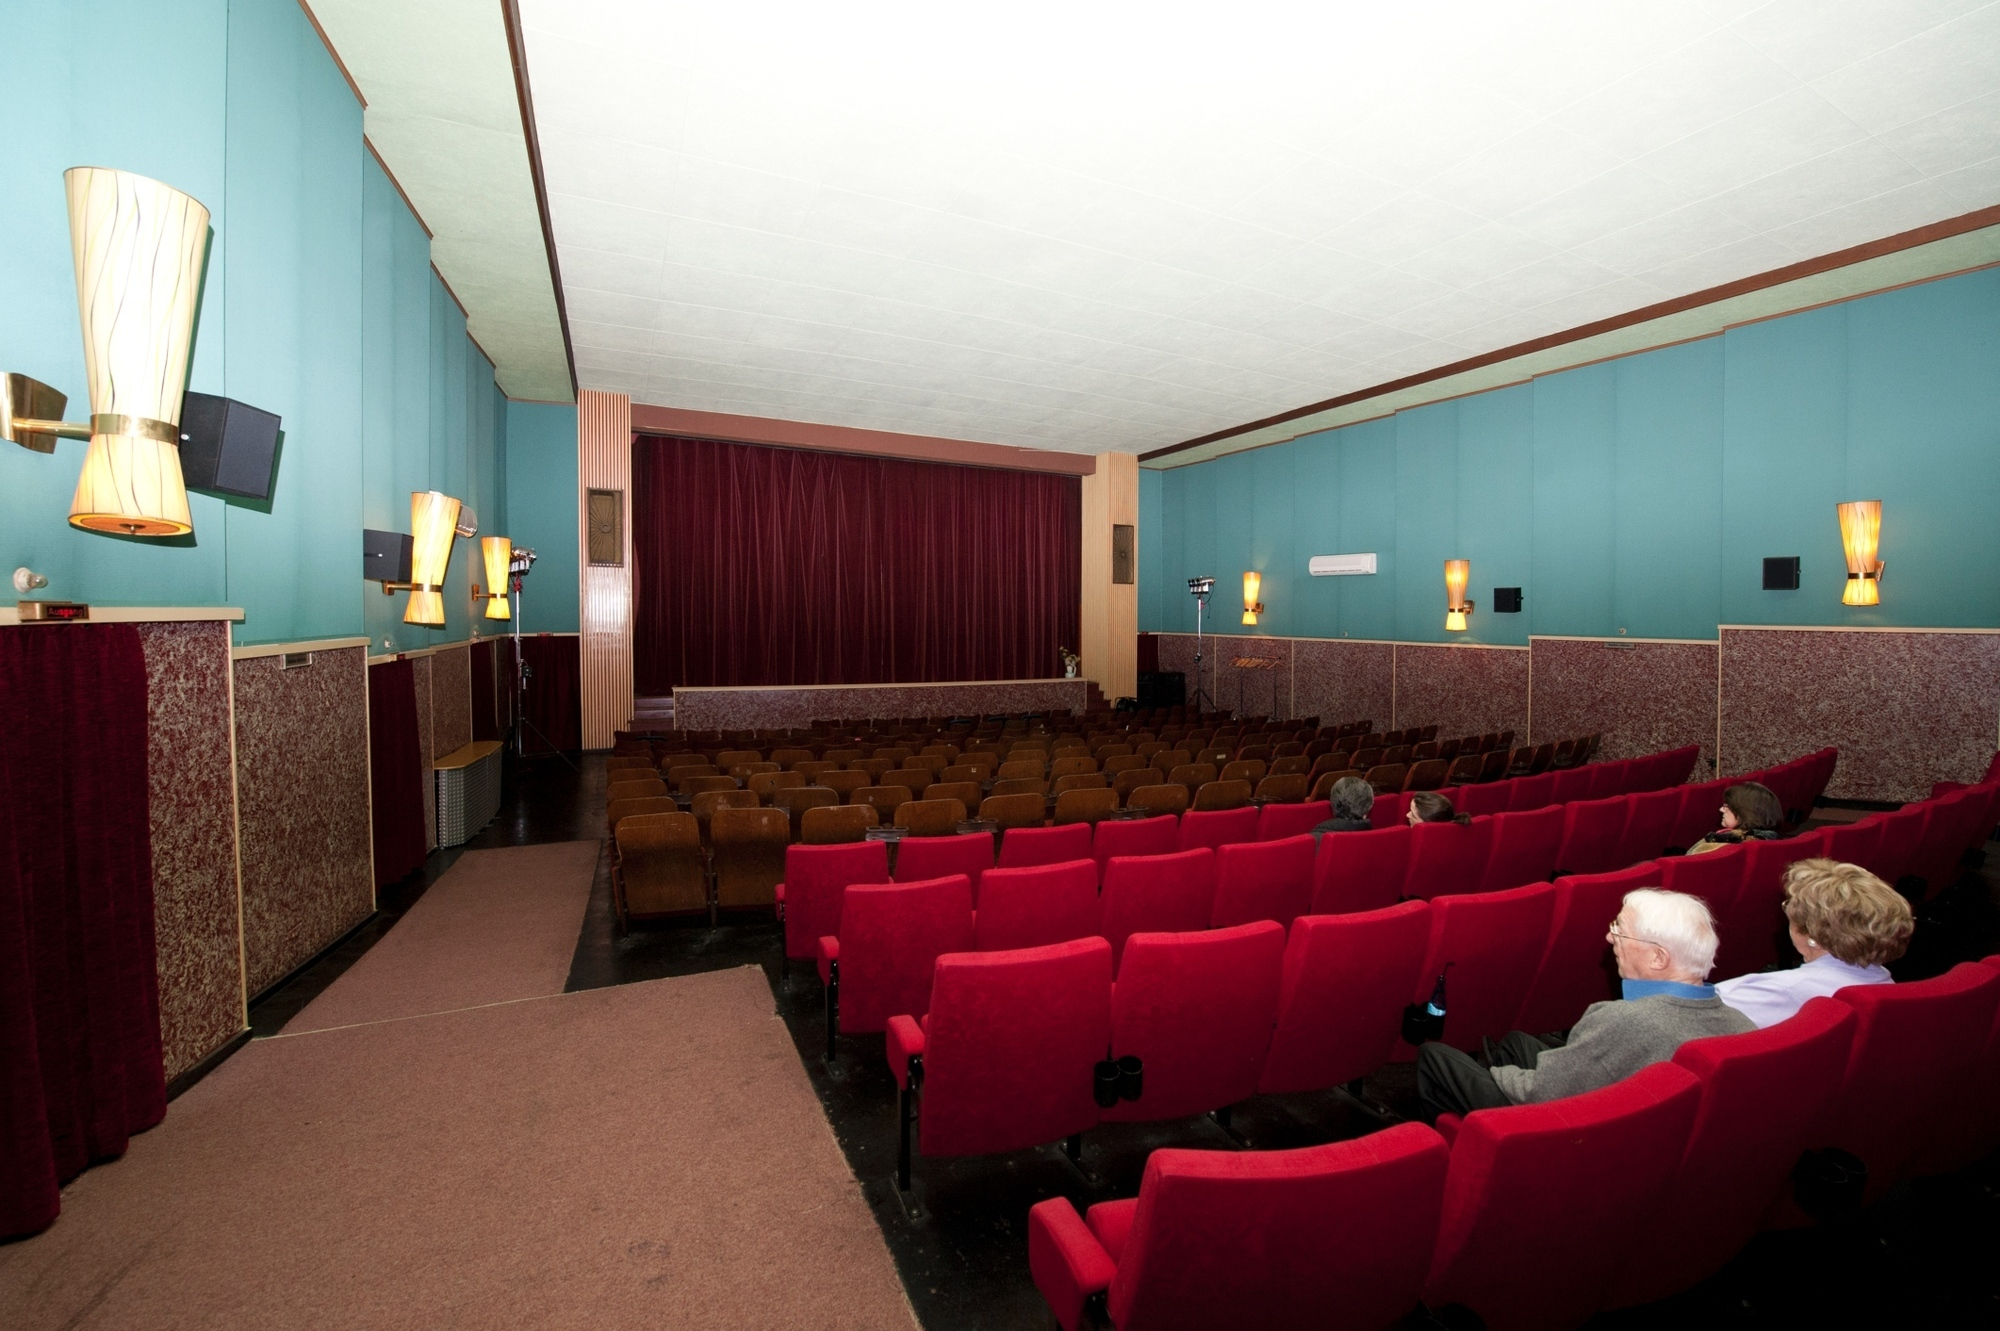 Kino Limburgerhof